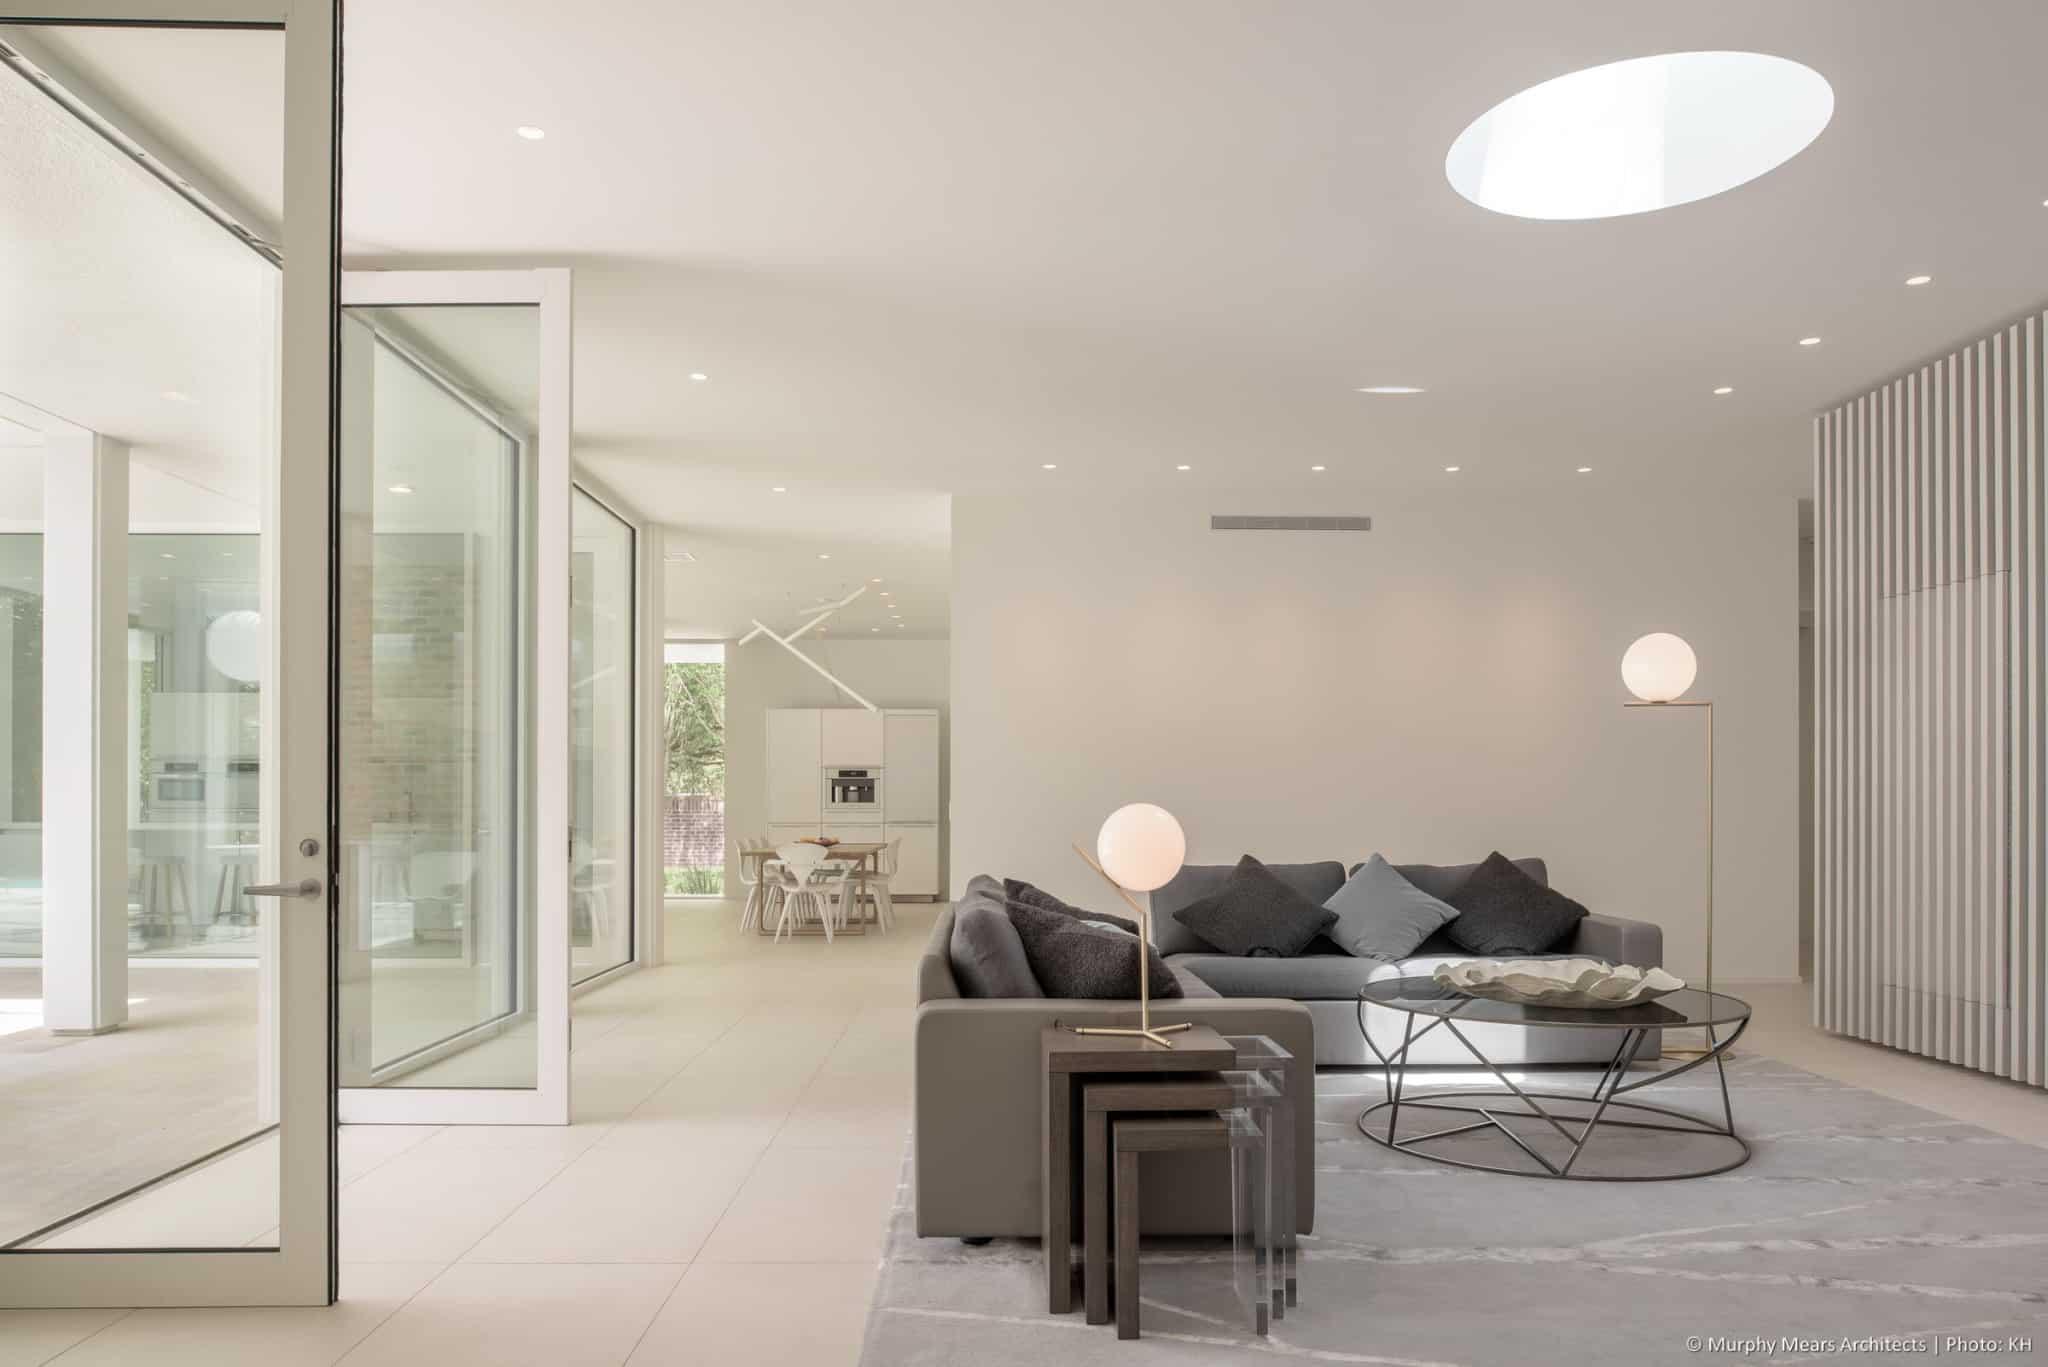 w-mid-century-modern-home-hugo-neuhaus-renovation-living-room-skylight-fin-wall2.jpg